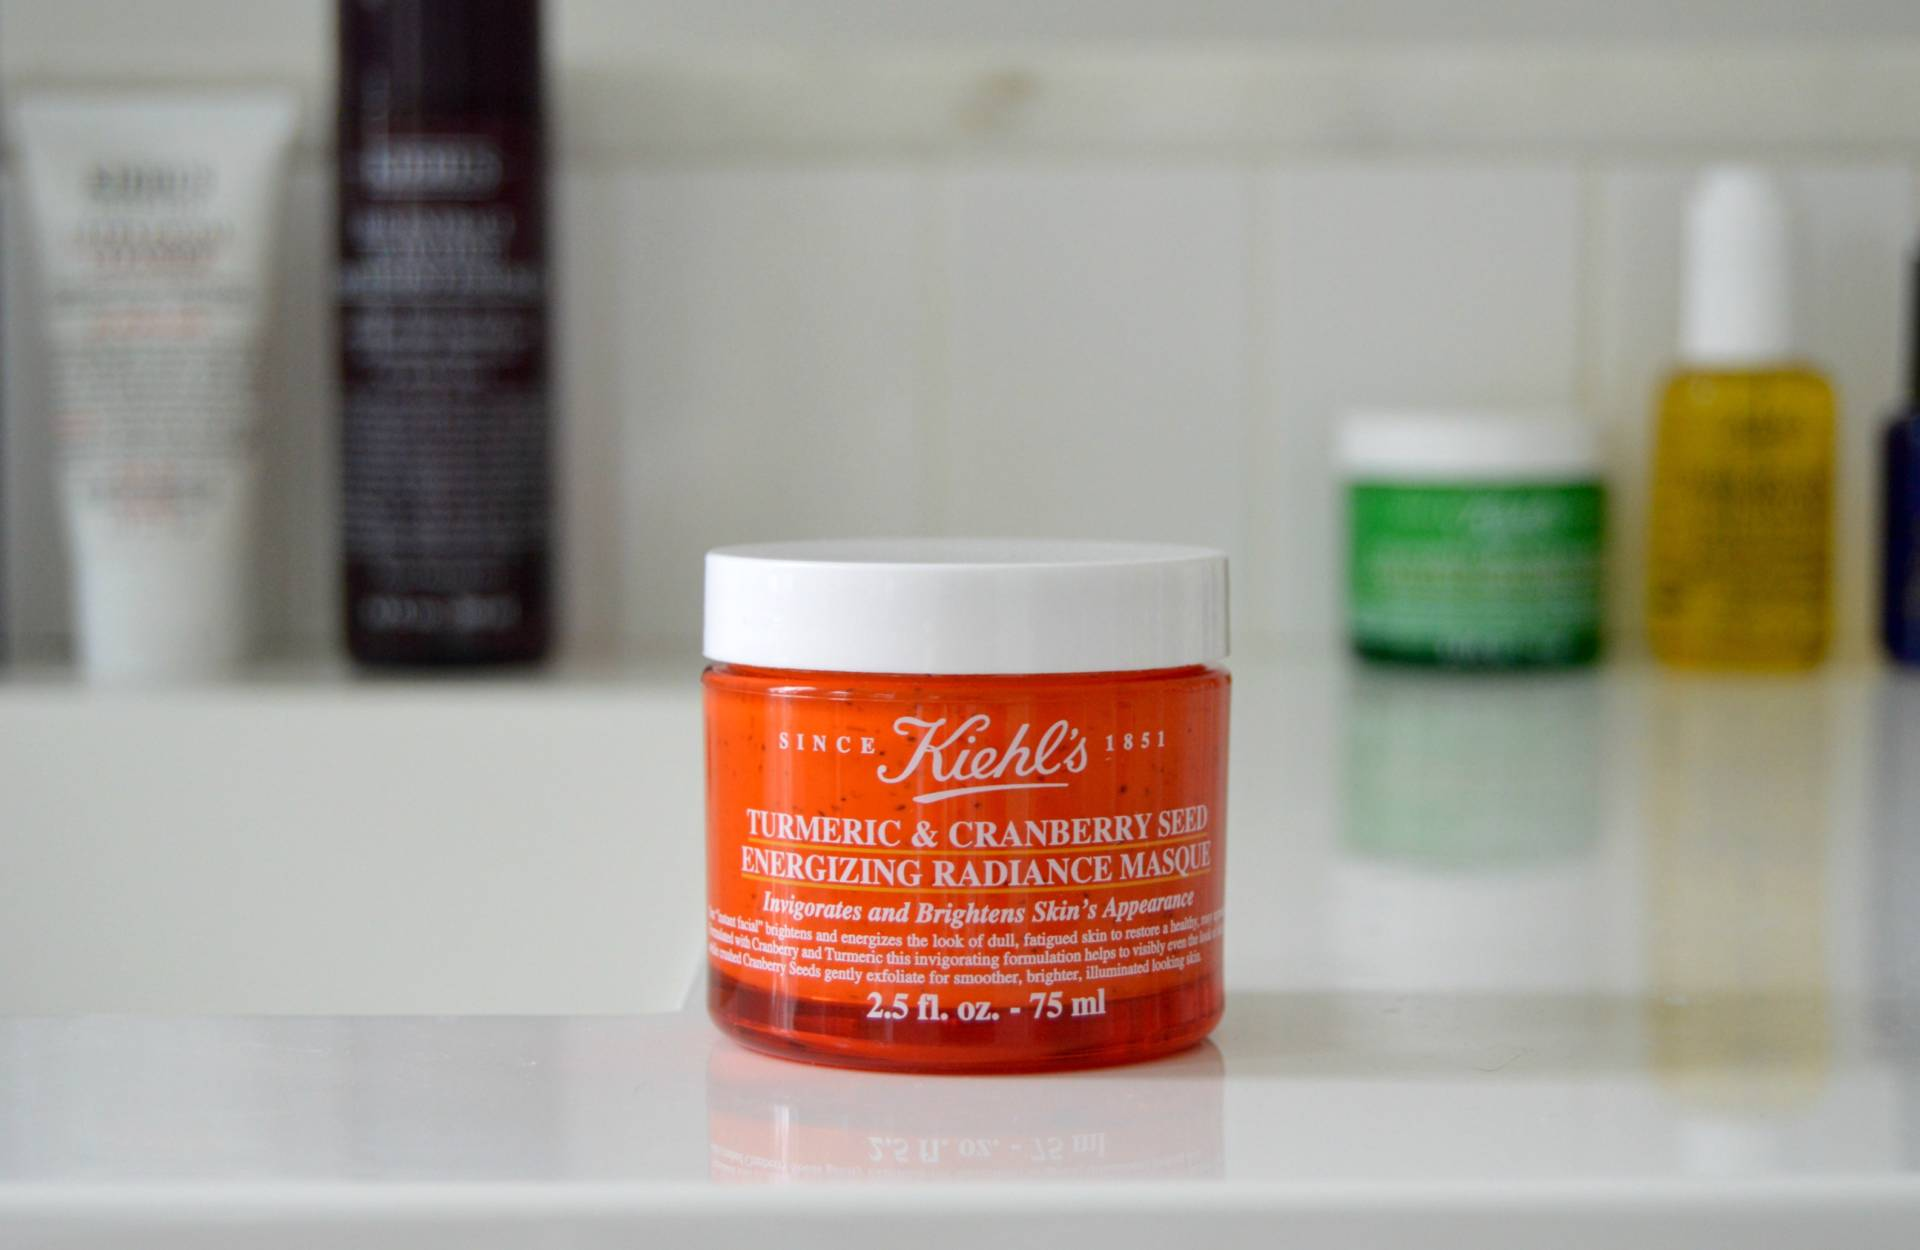 kiehls turmeric cranberry seed radiance masque review inhautepursuit